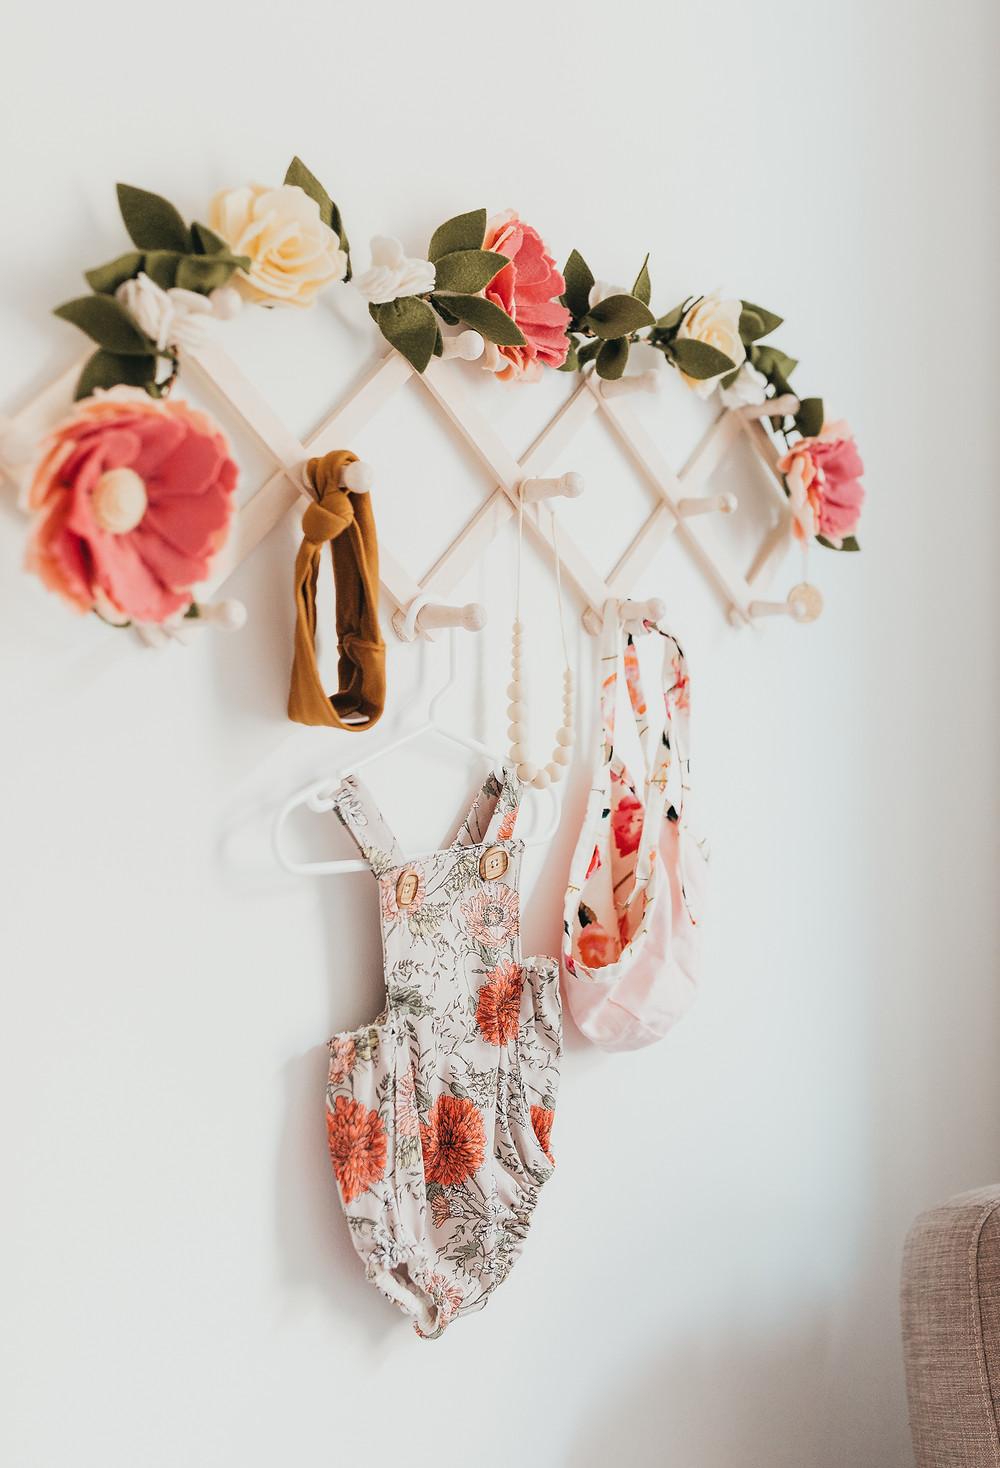 A felt floral garland hanging off an accordian rack in a nursery.